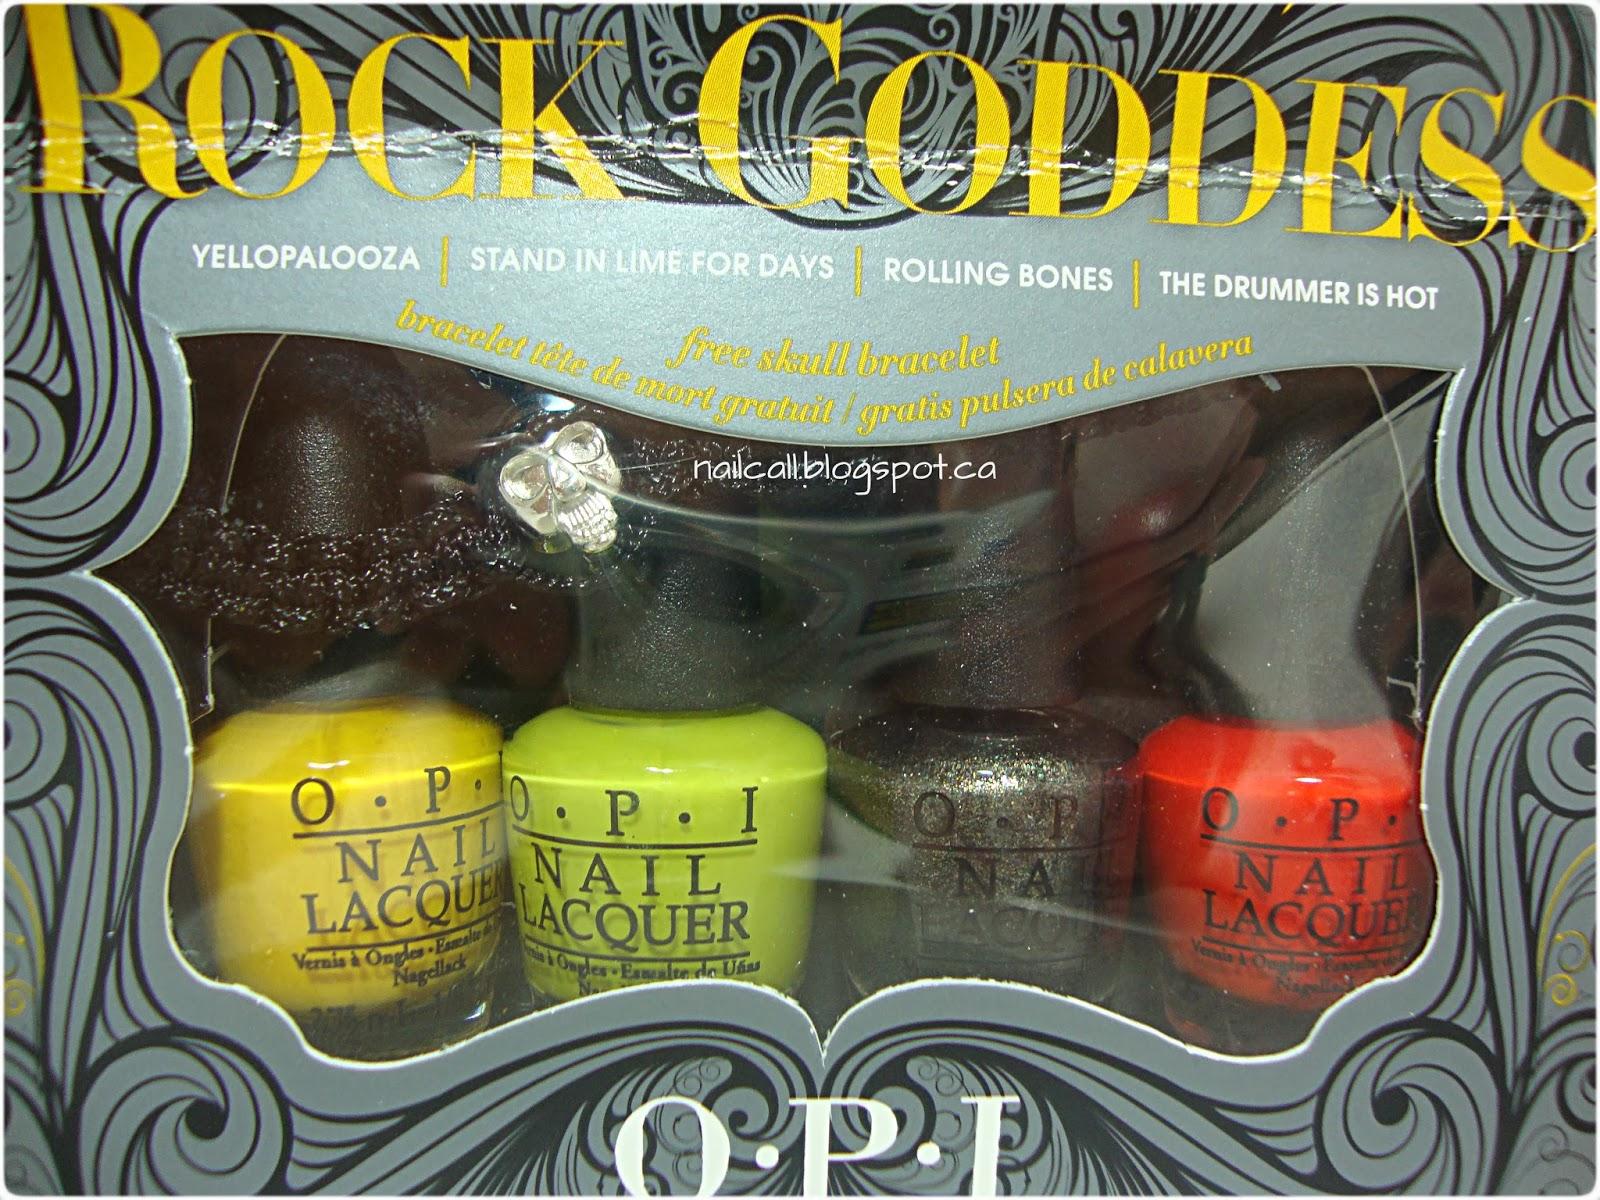 OPI Rock Goddess box set